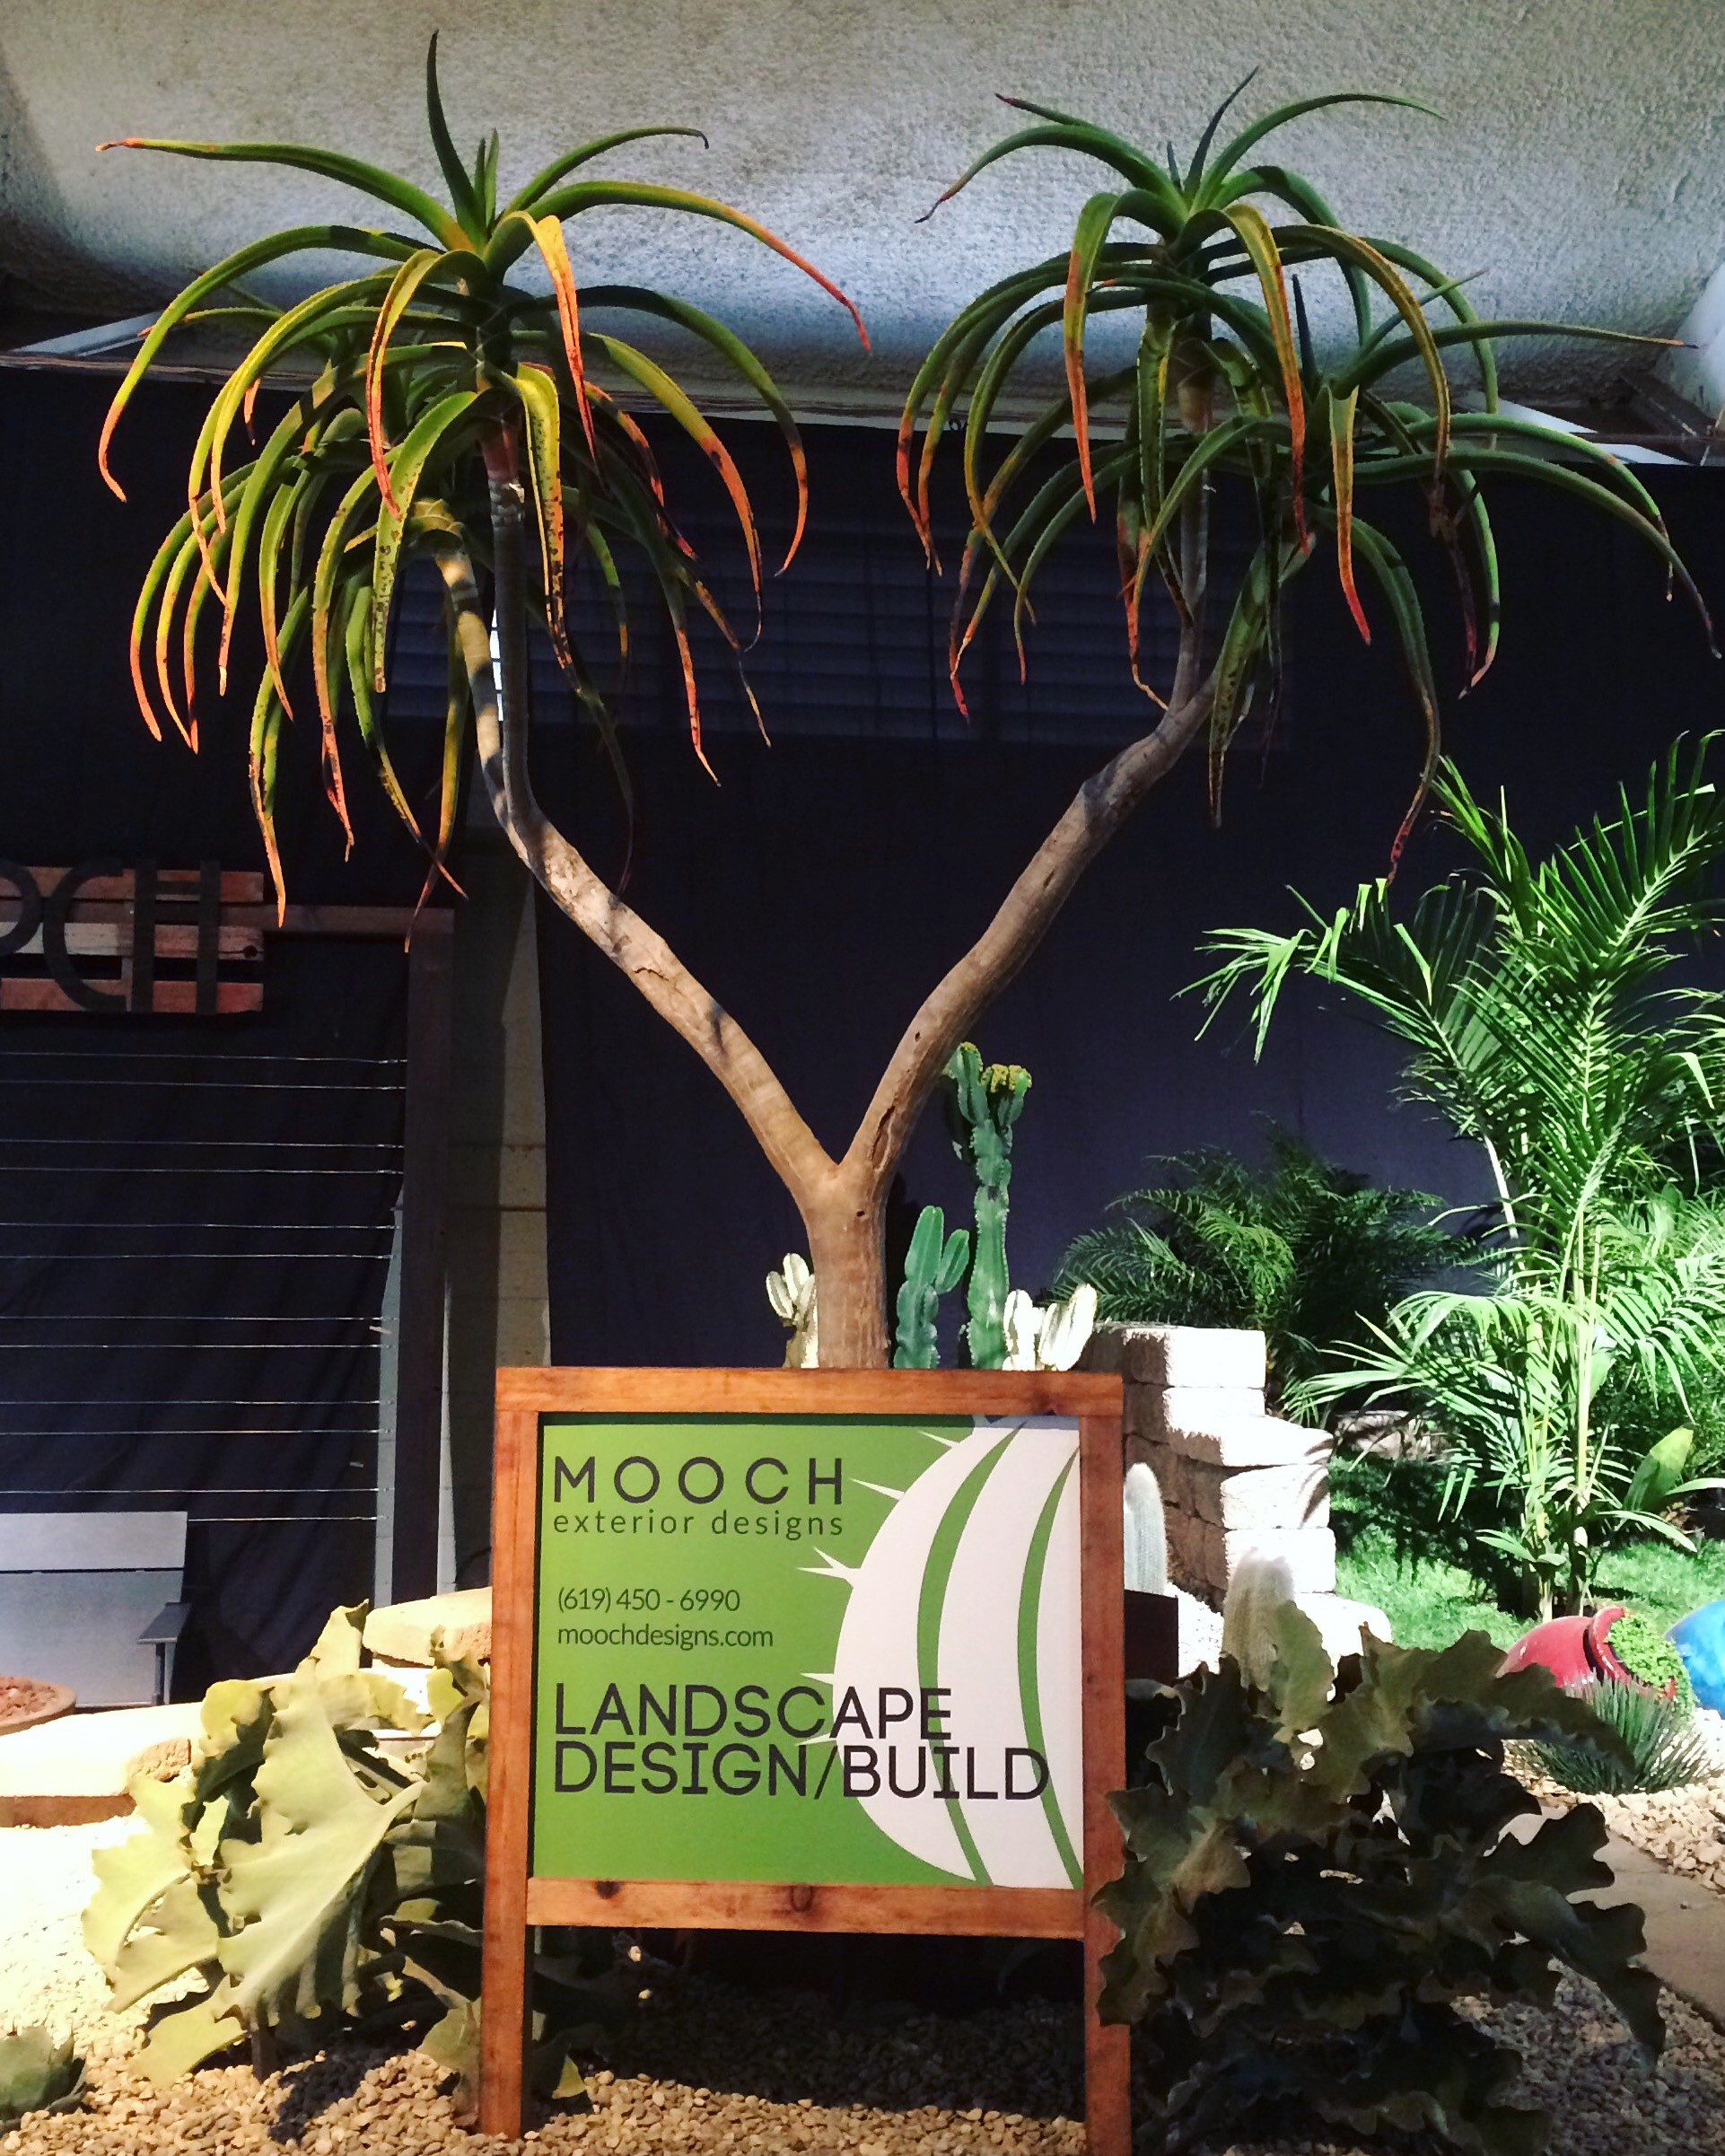 San Diego Home & Garden Show